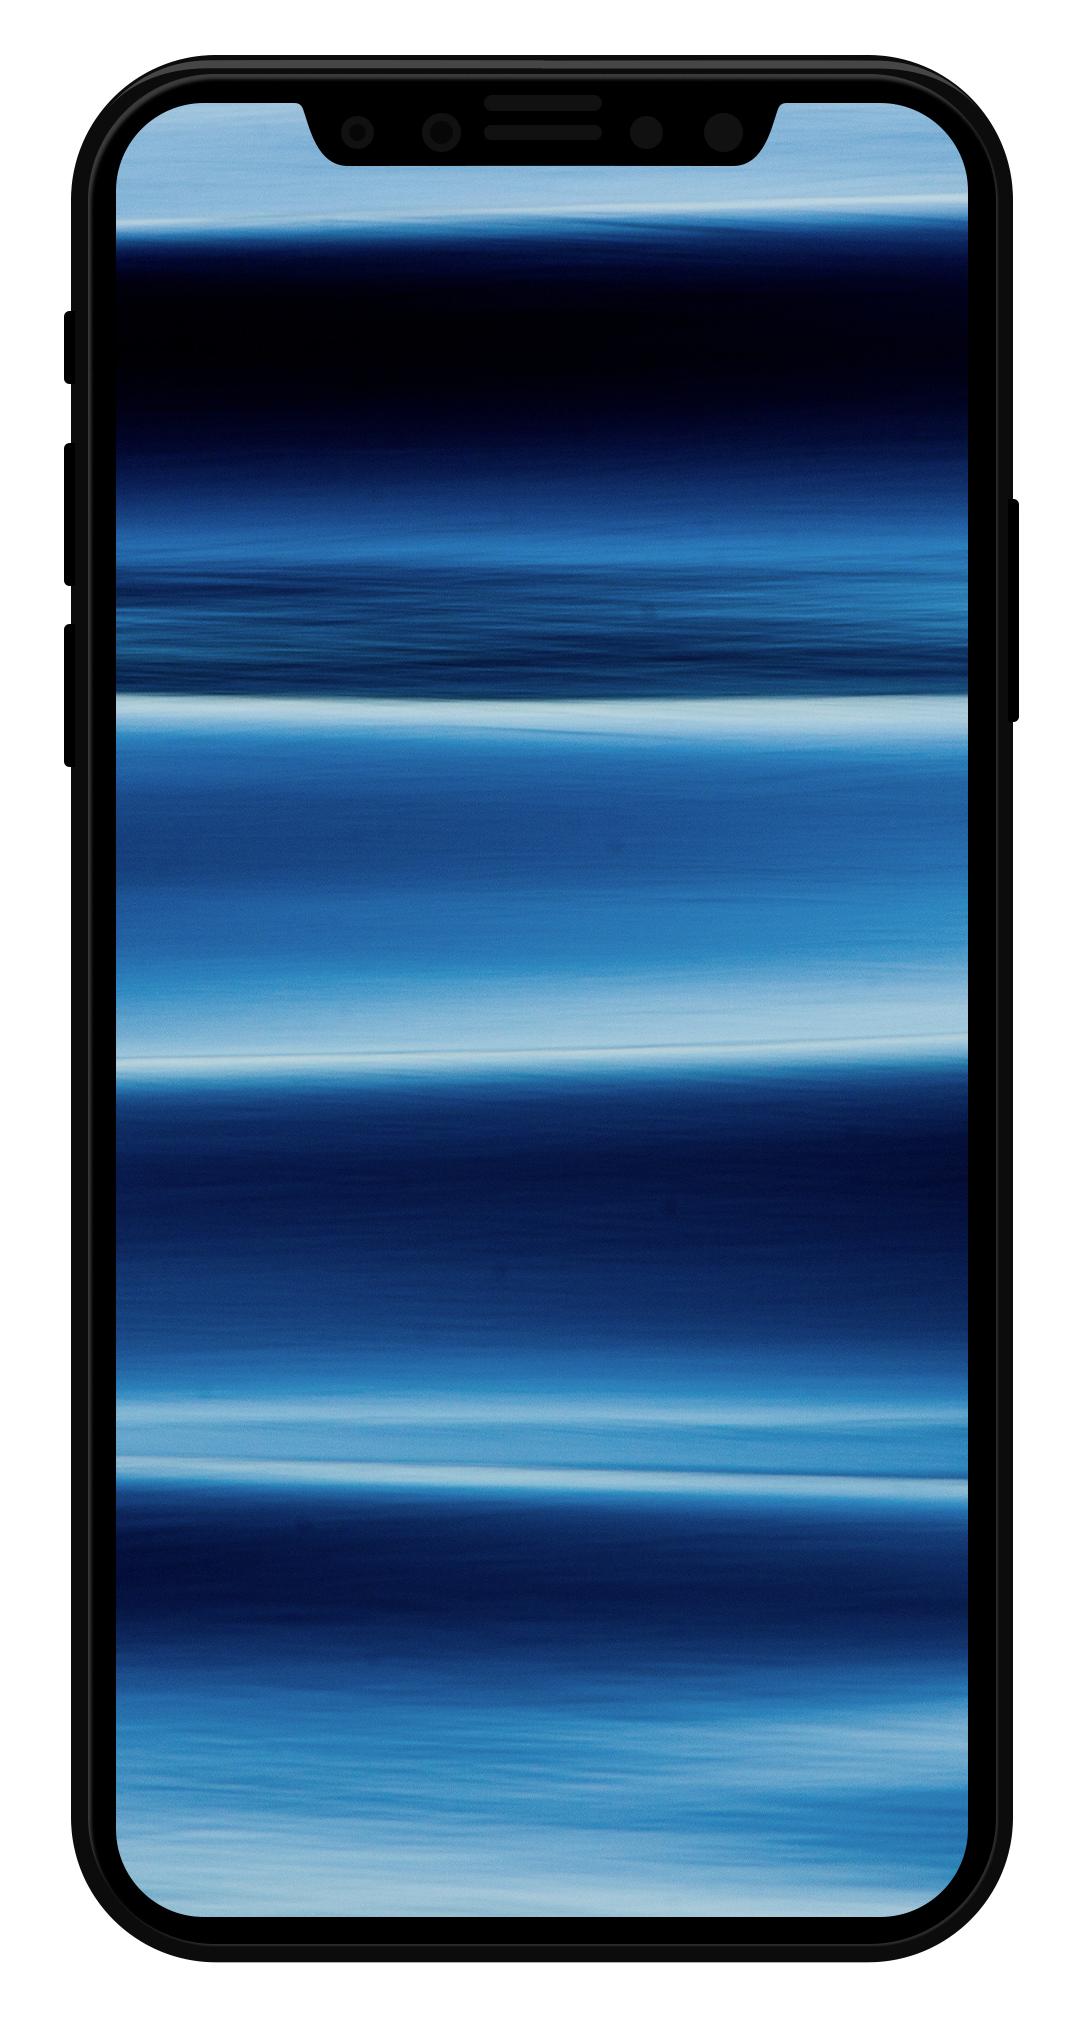 iphone-8-mockuhgp-downloadable.jpg